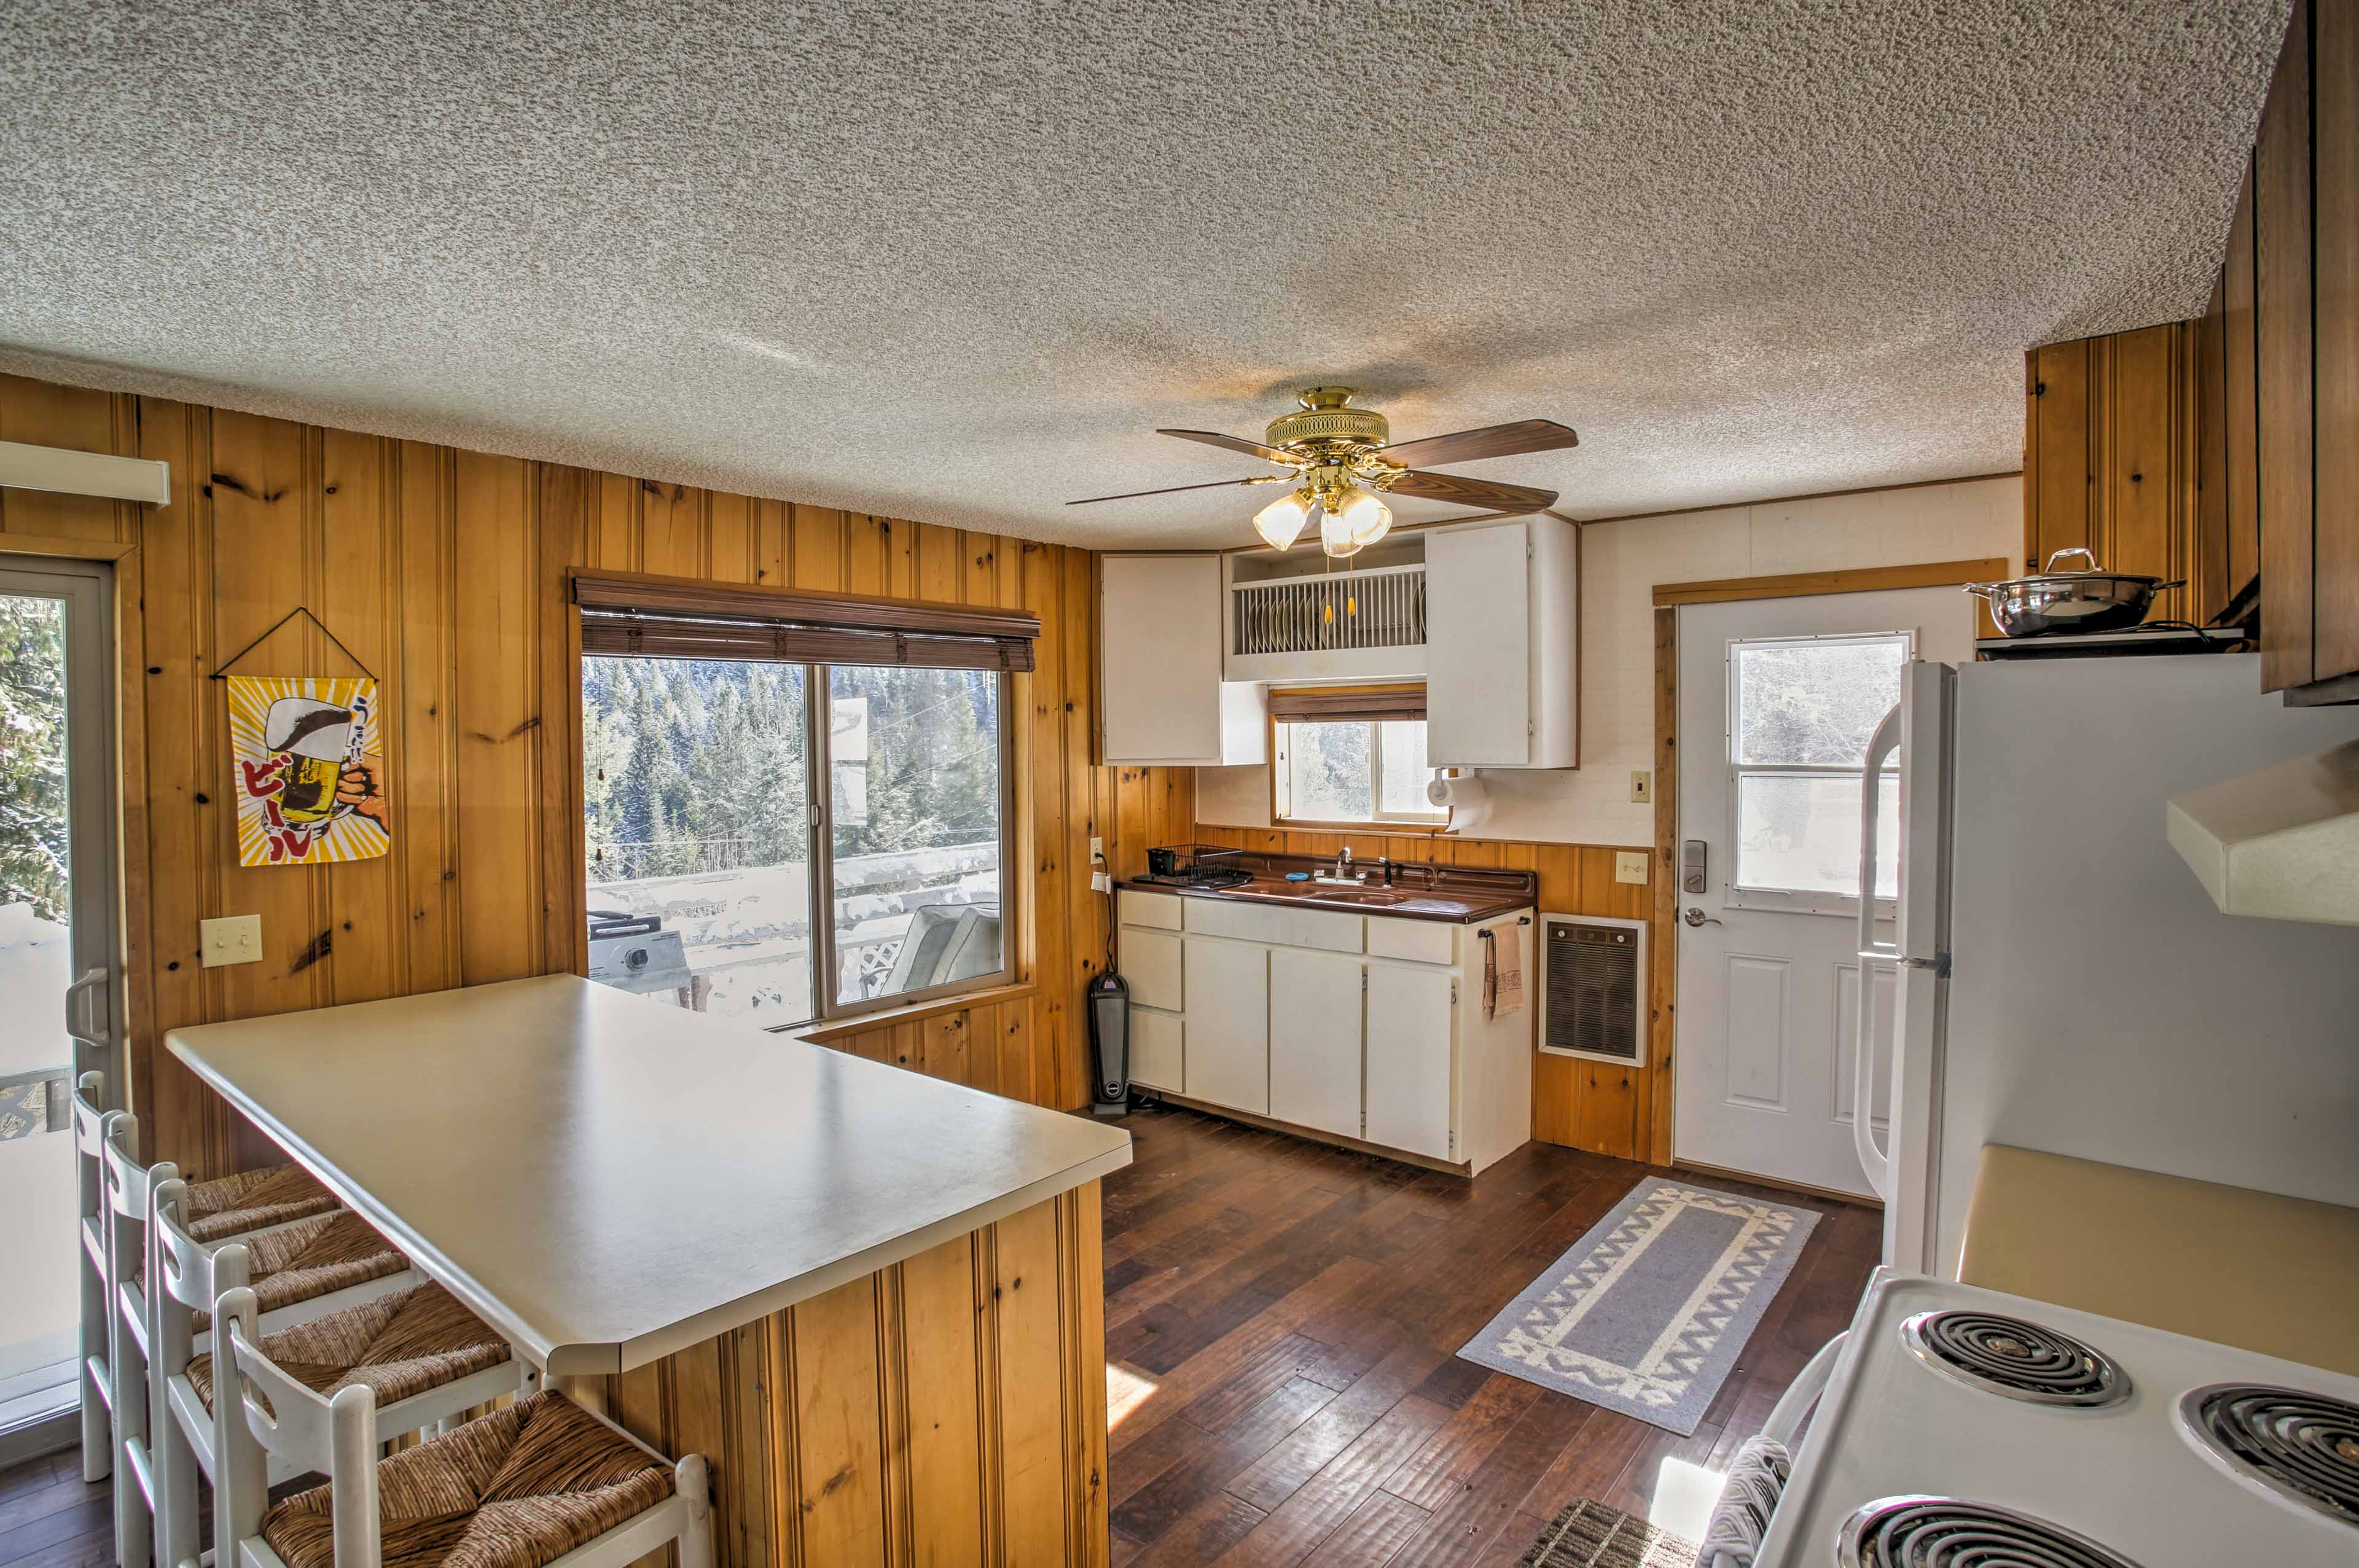 Hardwood floors & numerous windows create a warm and inviting atmosphere.